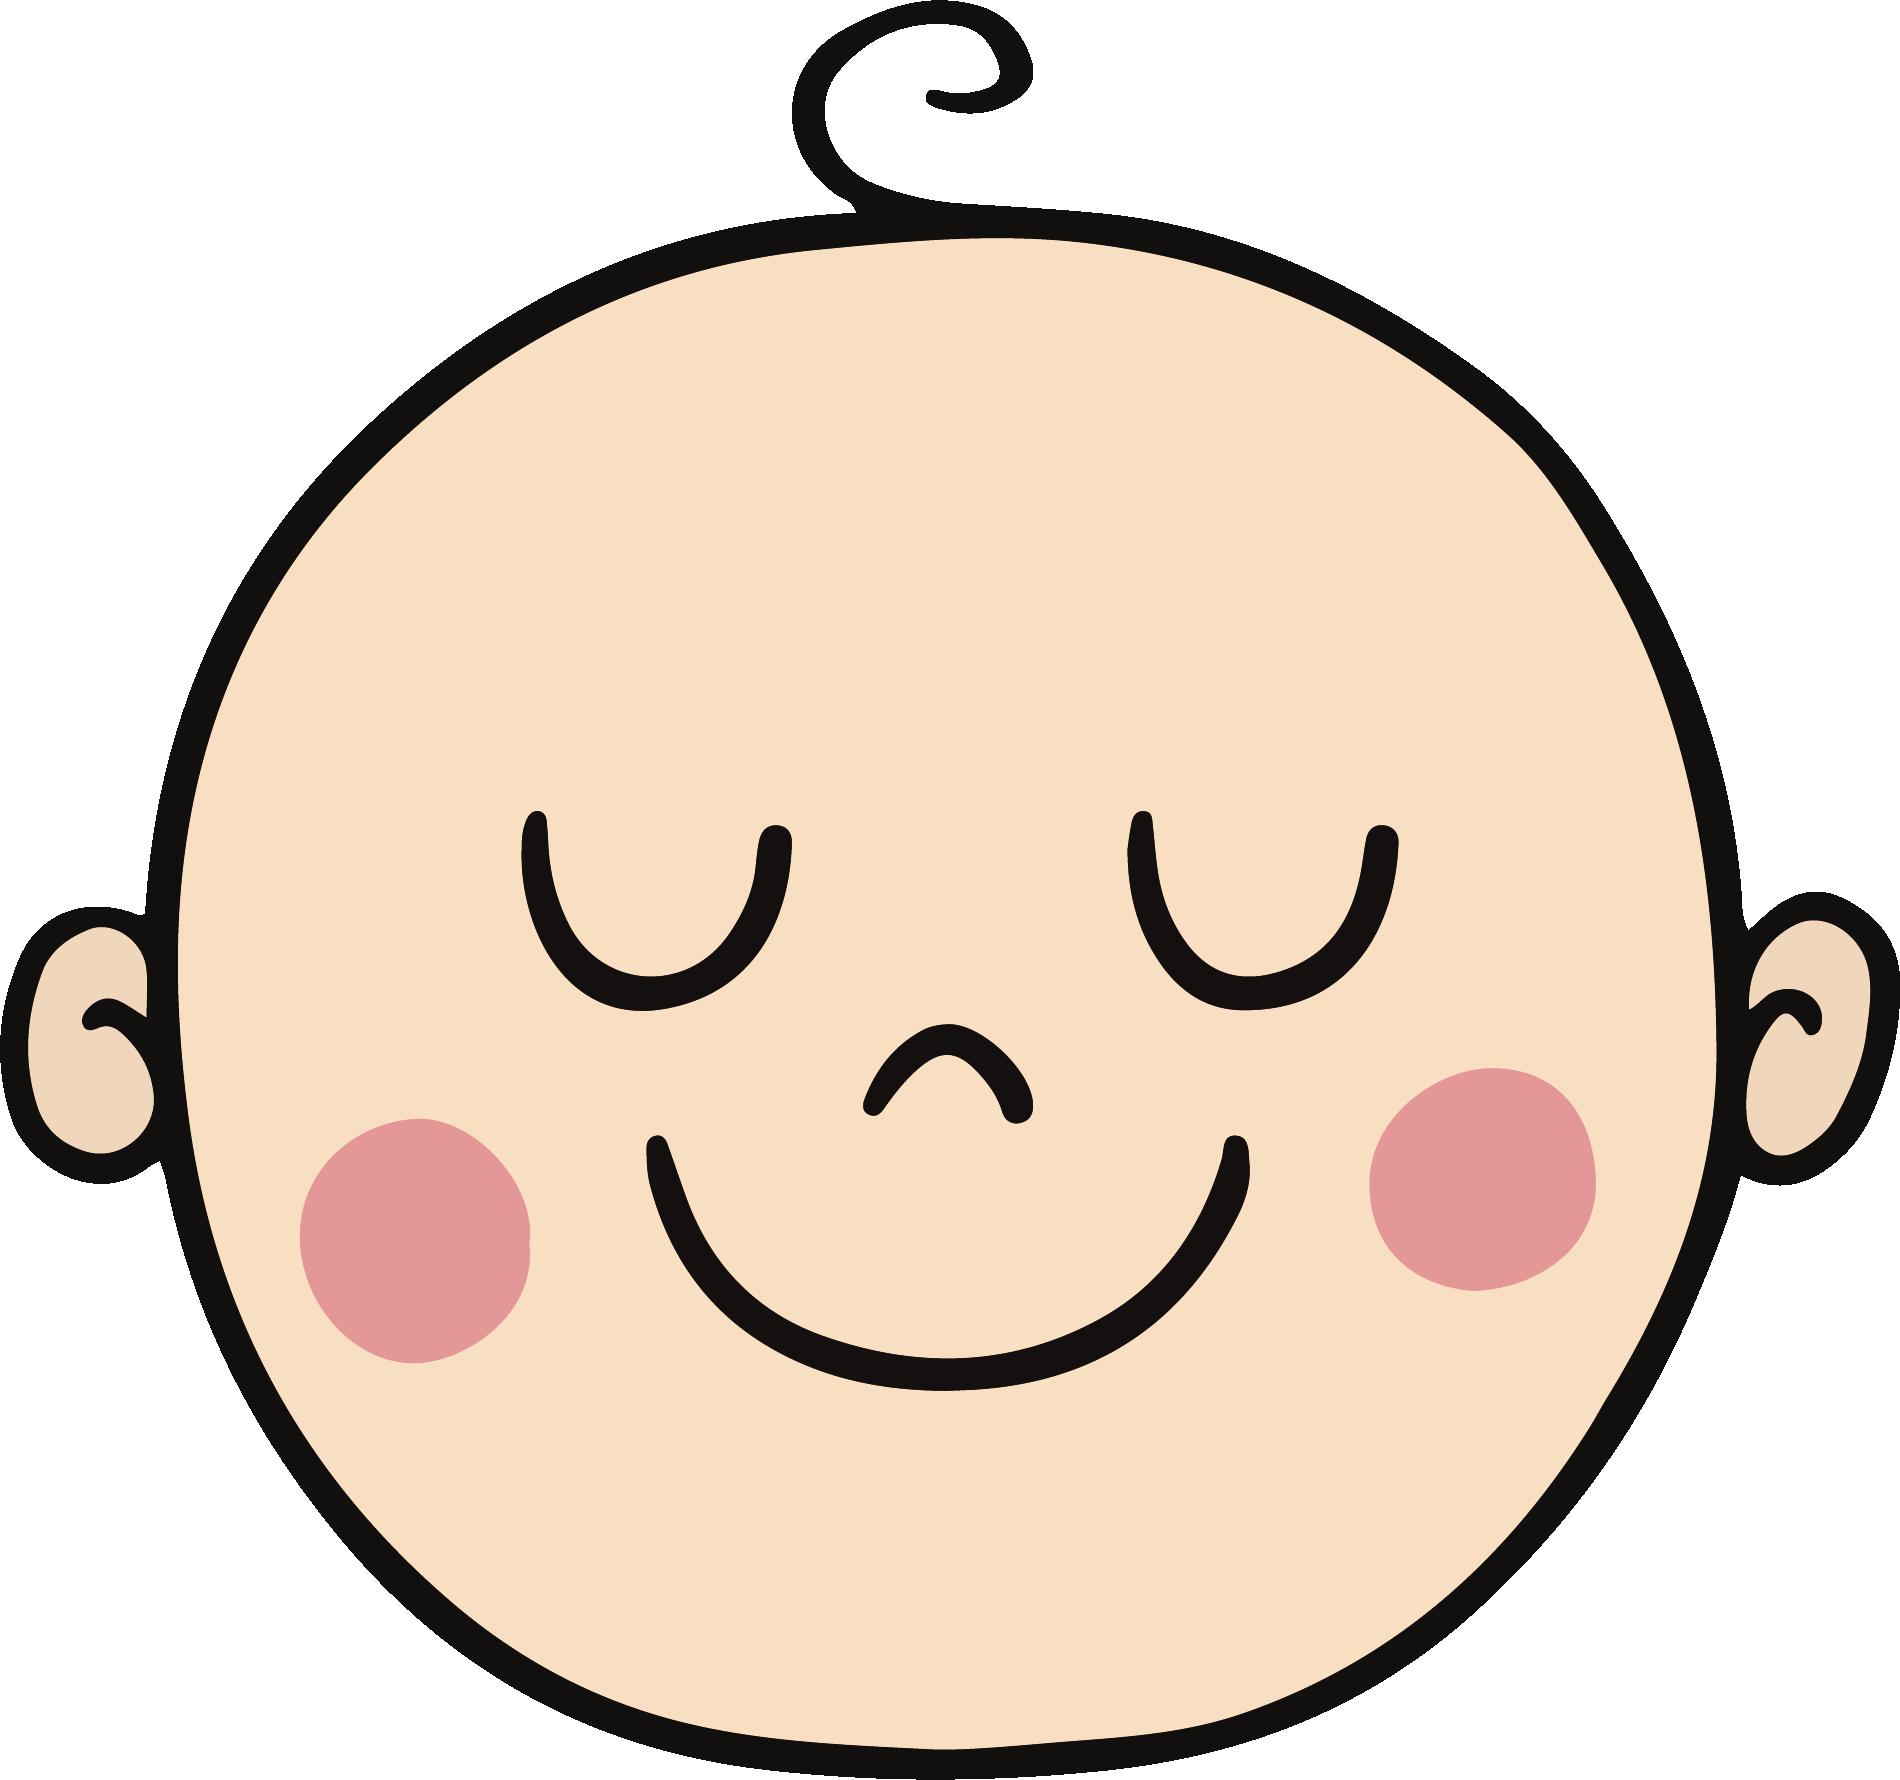 jpg Drawing Avatar Smile Clip art